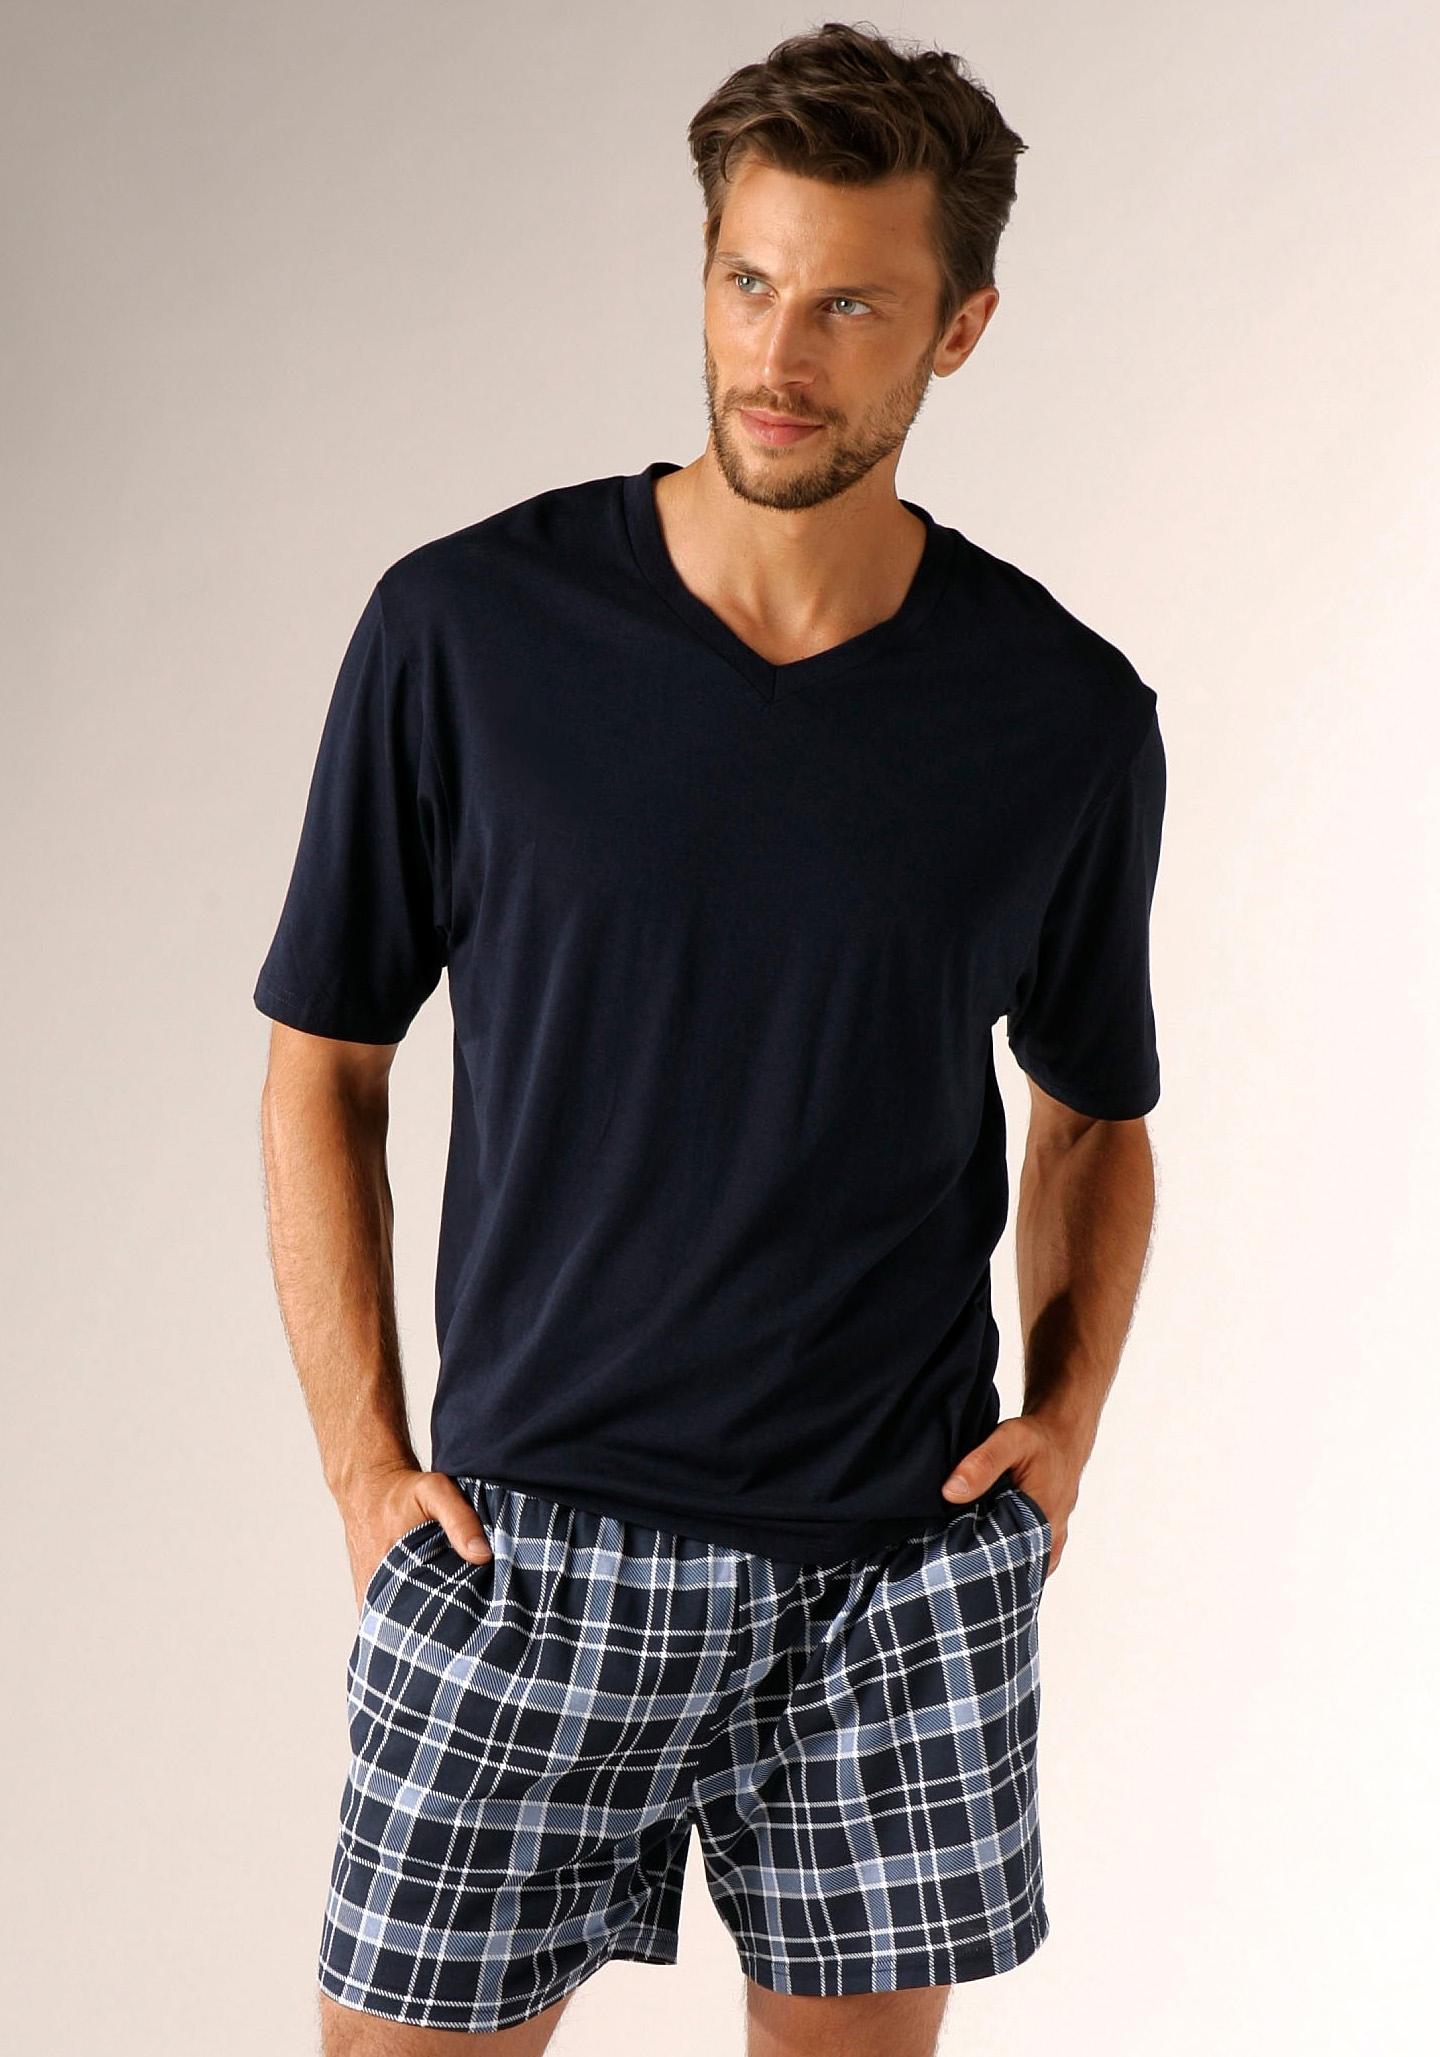 s.Oliver RED LABEL Beachwear shortama met steekzakken opzij - gratis ruilen op lascana.nl